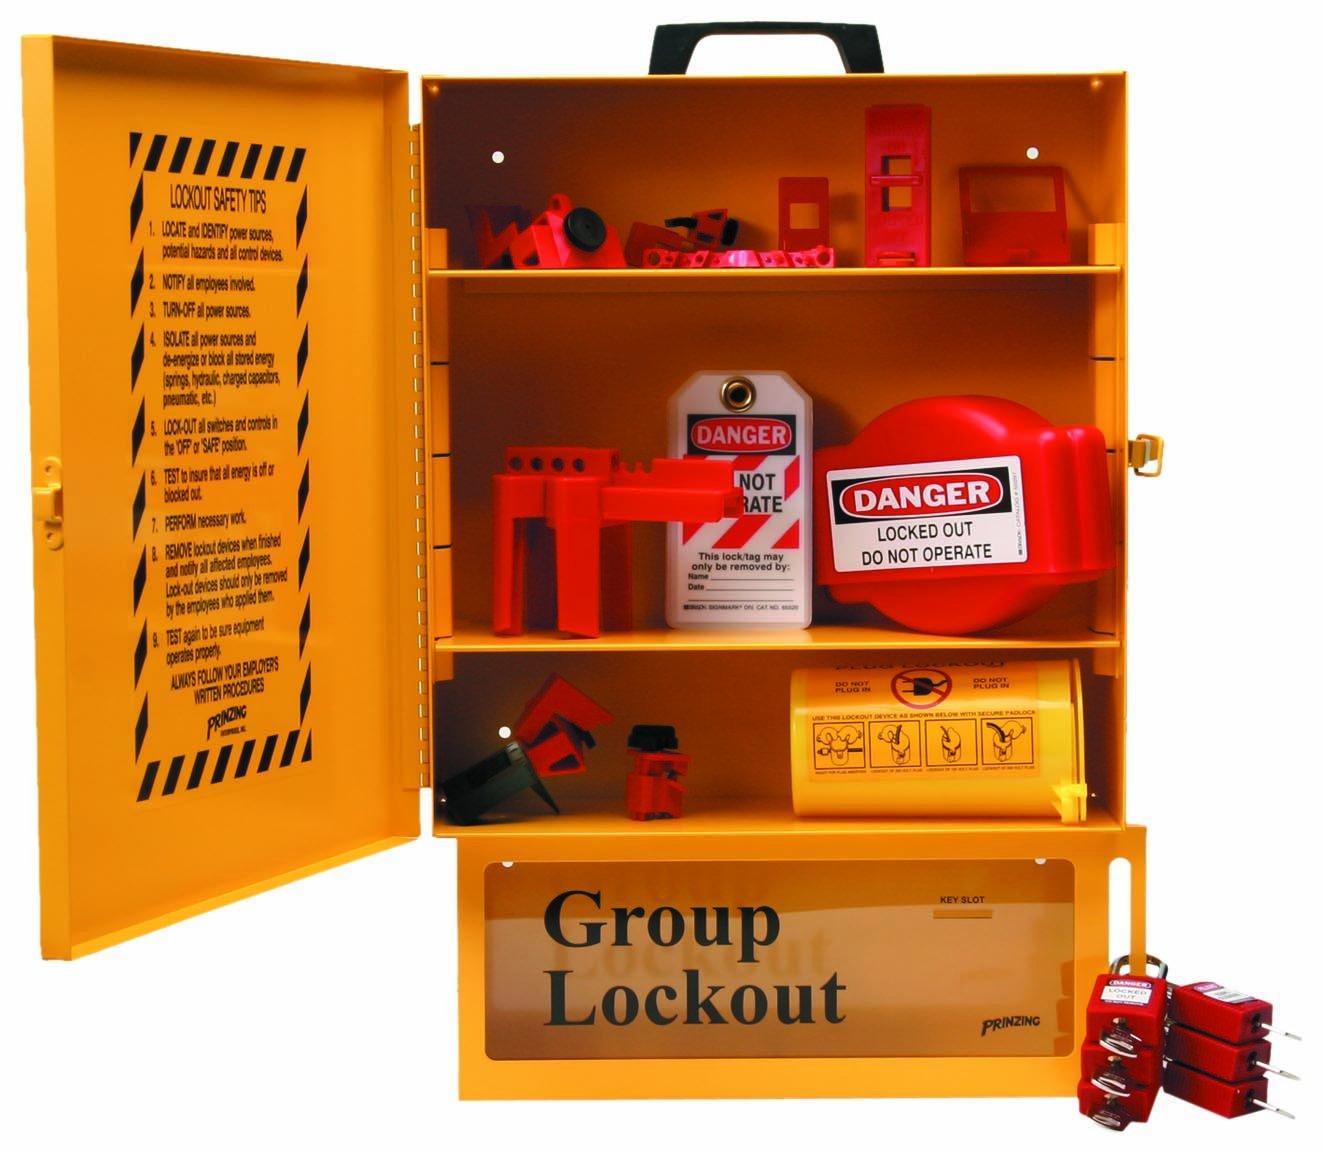 Brady Combined Lockout And Lock Box Station, Legend ''Safety Lockout Center'', Includes 6 Safety Padlocks